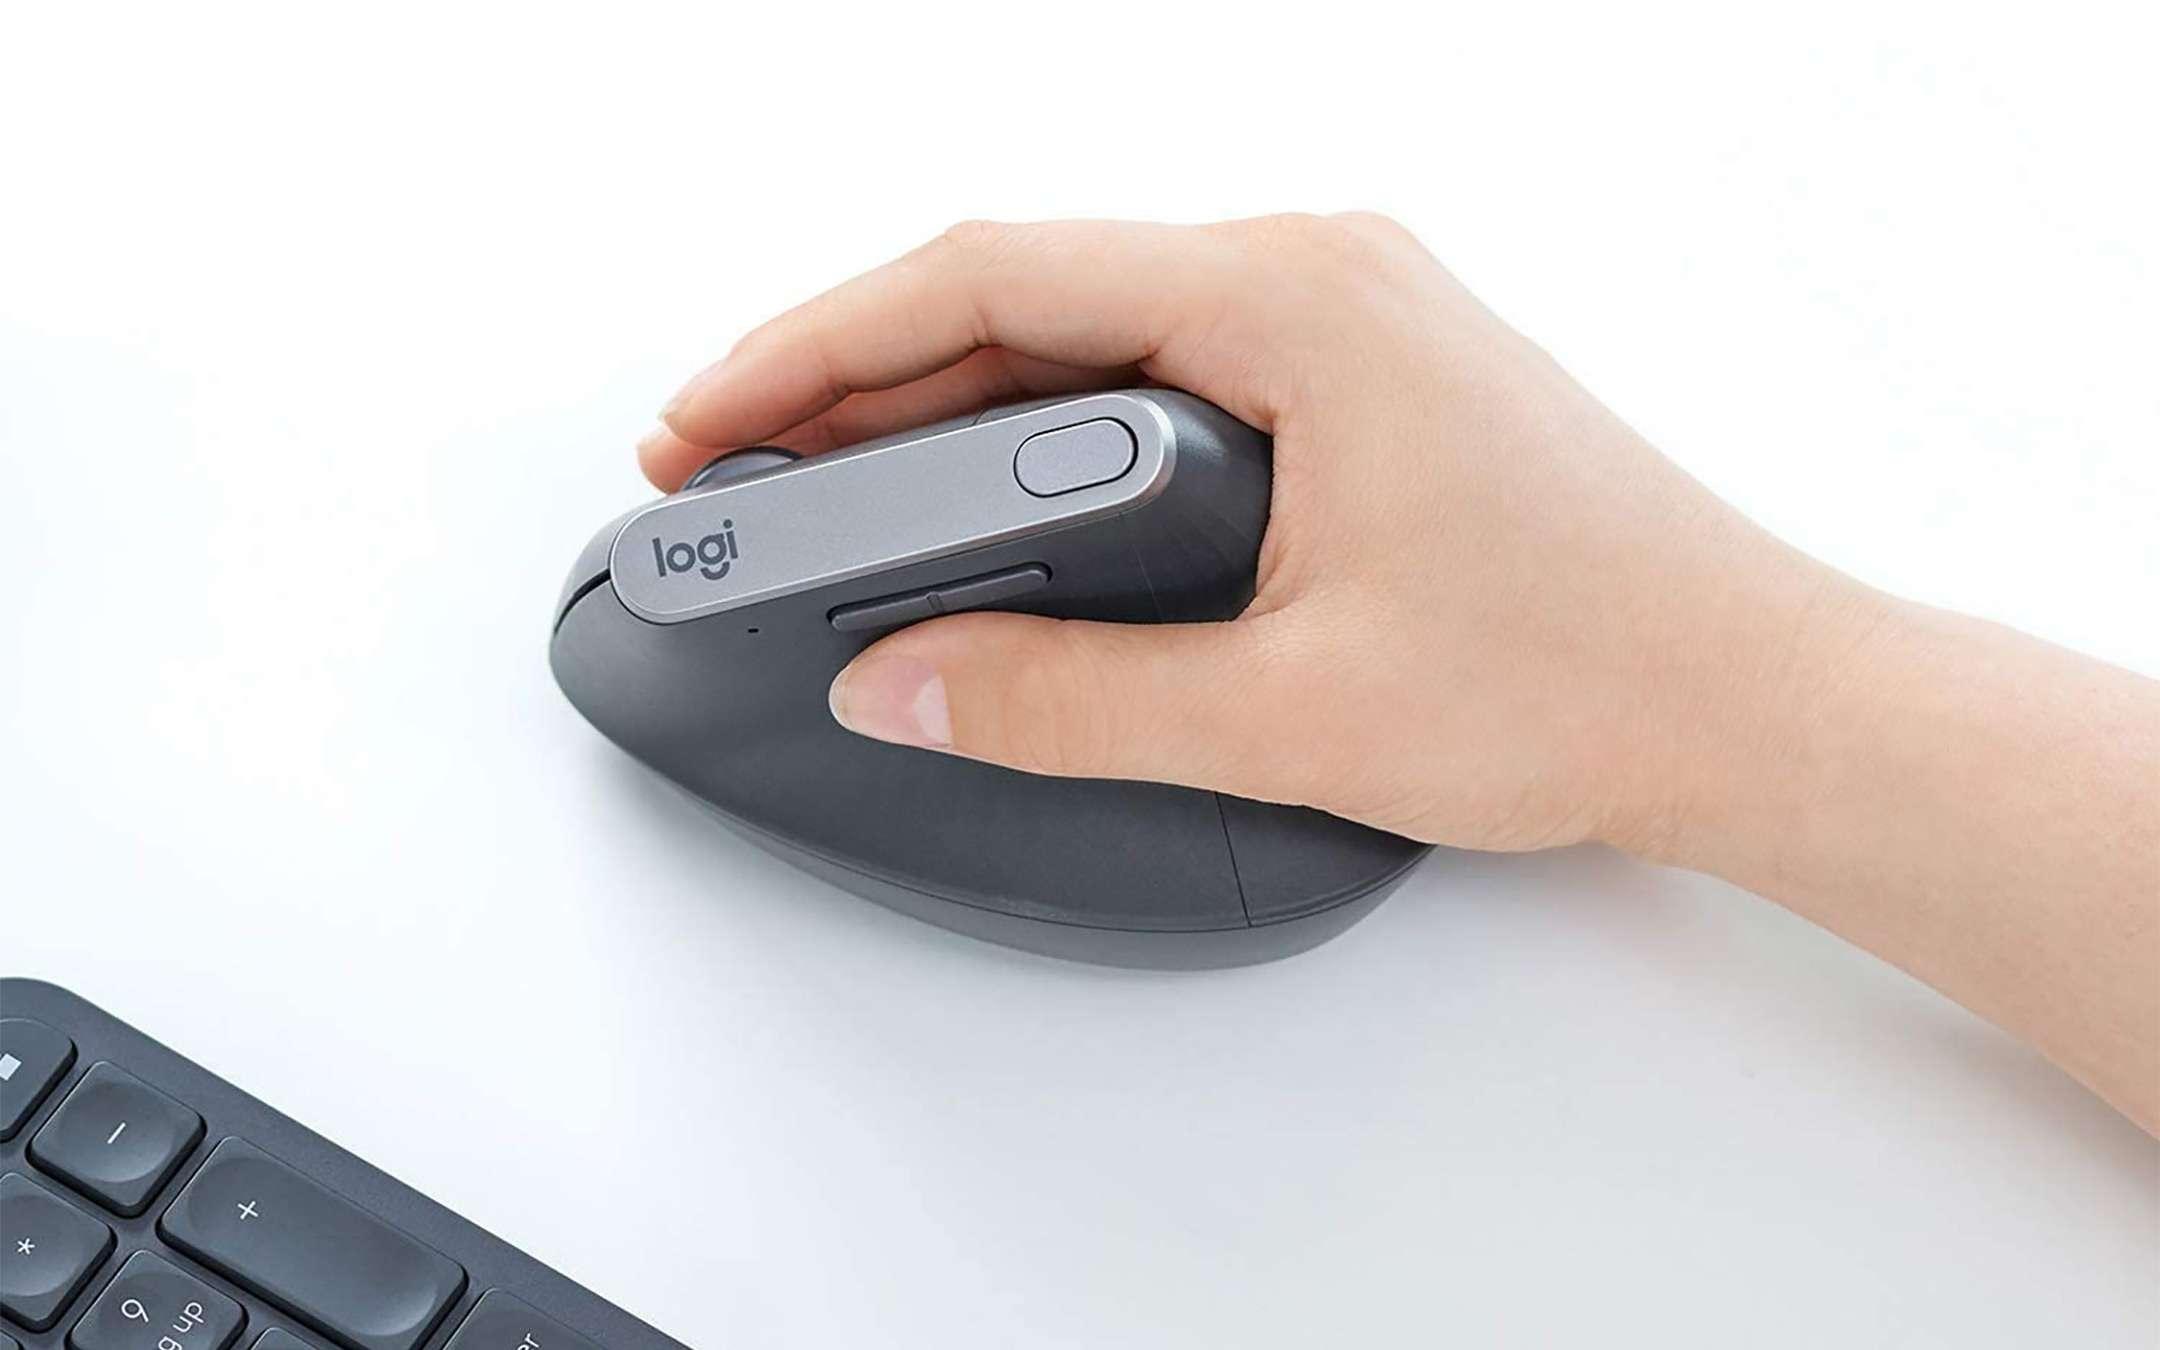 The Logitech MX Vertical mouse on sale on Amazon